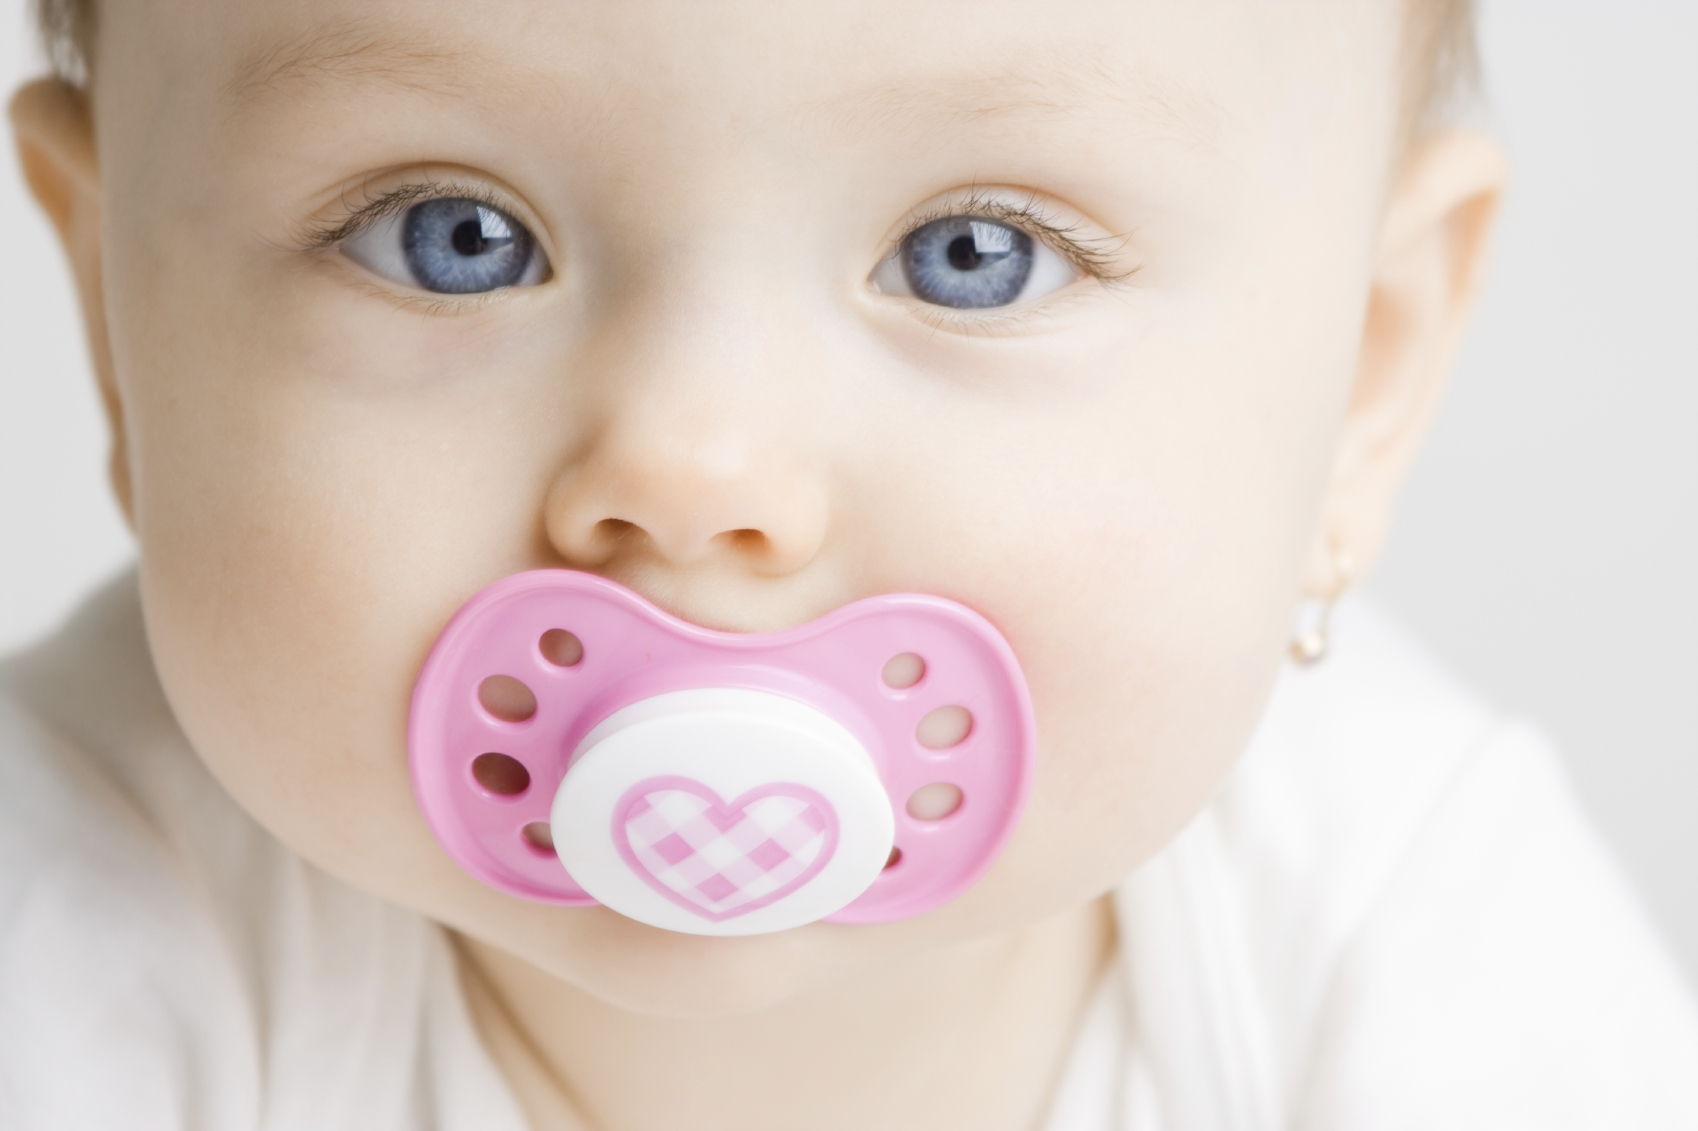 baby and dummy iStock_000006452944_Medium